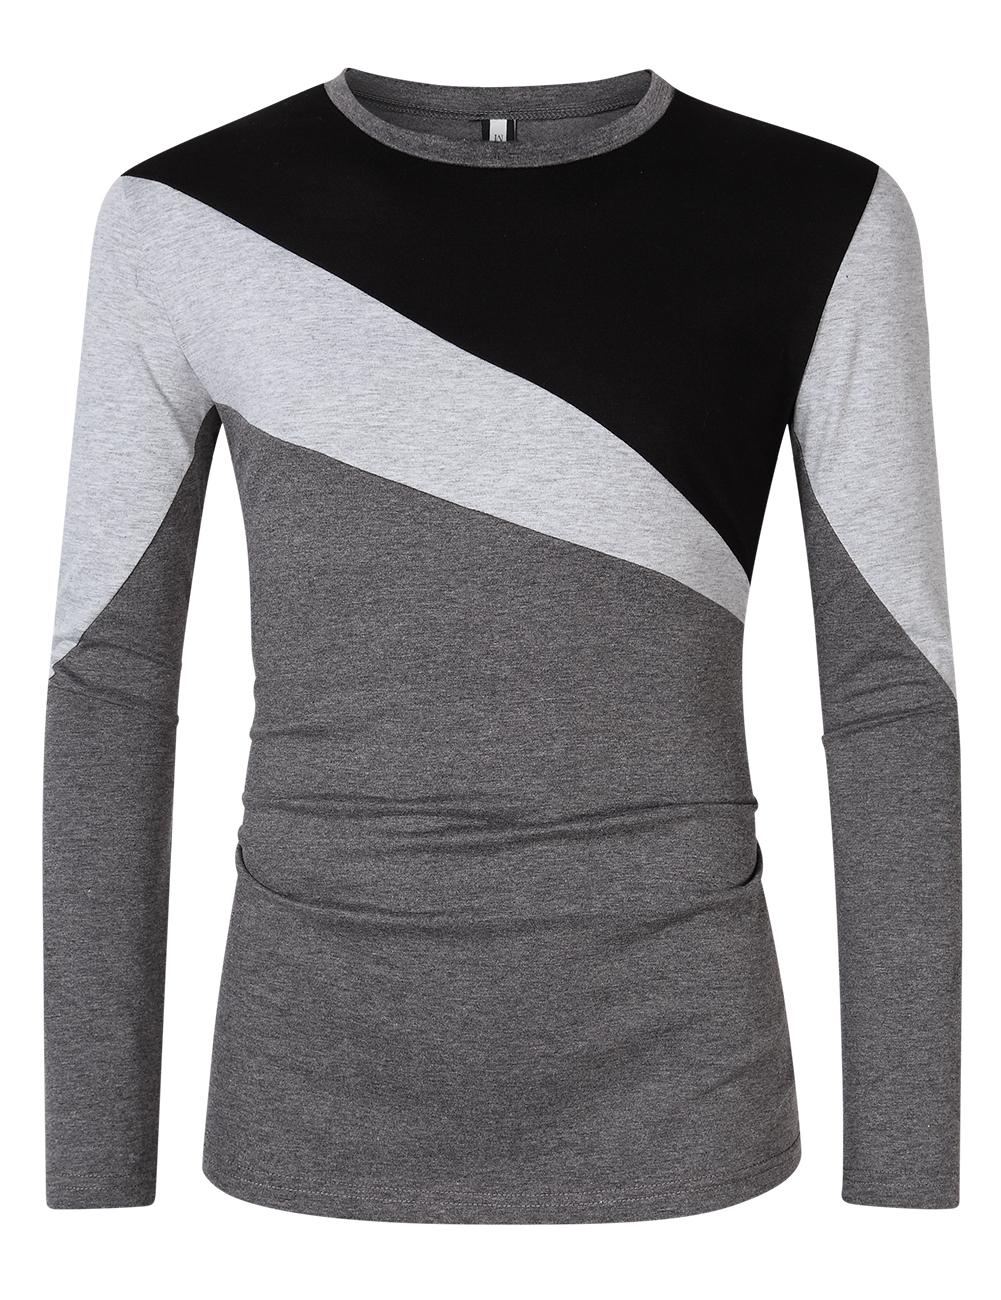 [US Direct] Yong Horse Men's Color Block Slim Fit Crew Neck Long Sleeve Basic T-Shirt